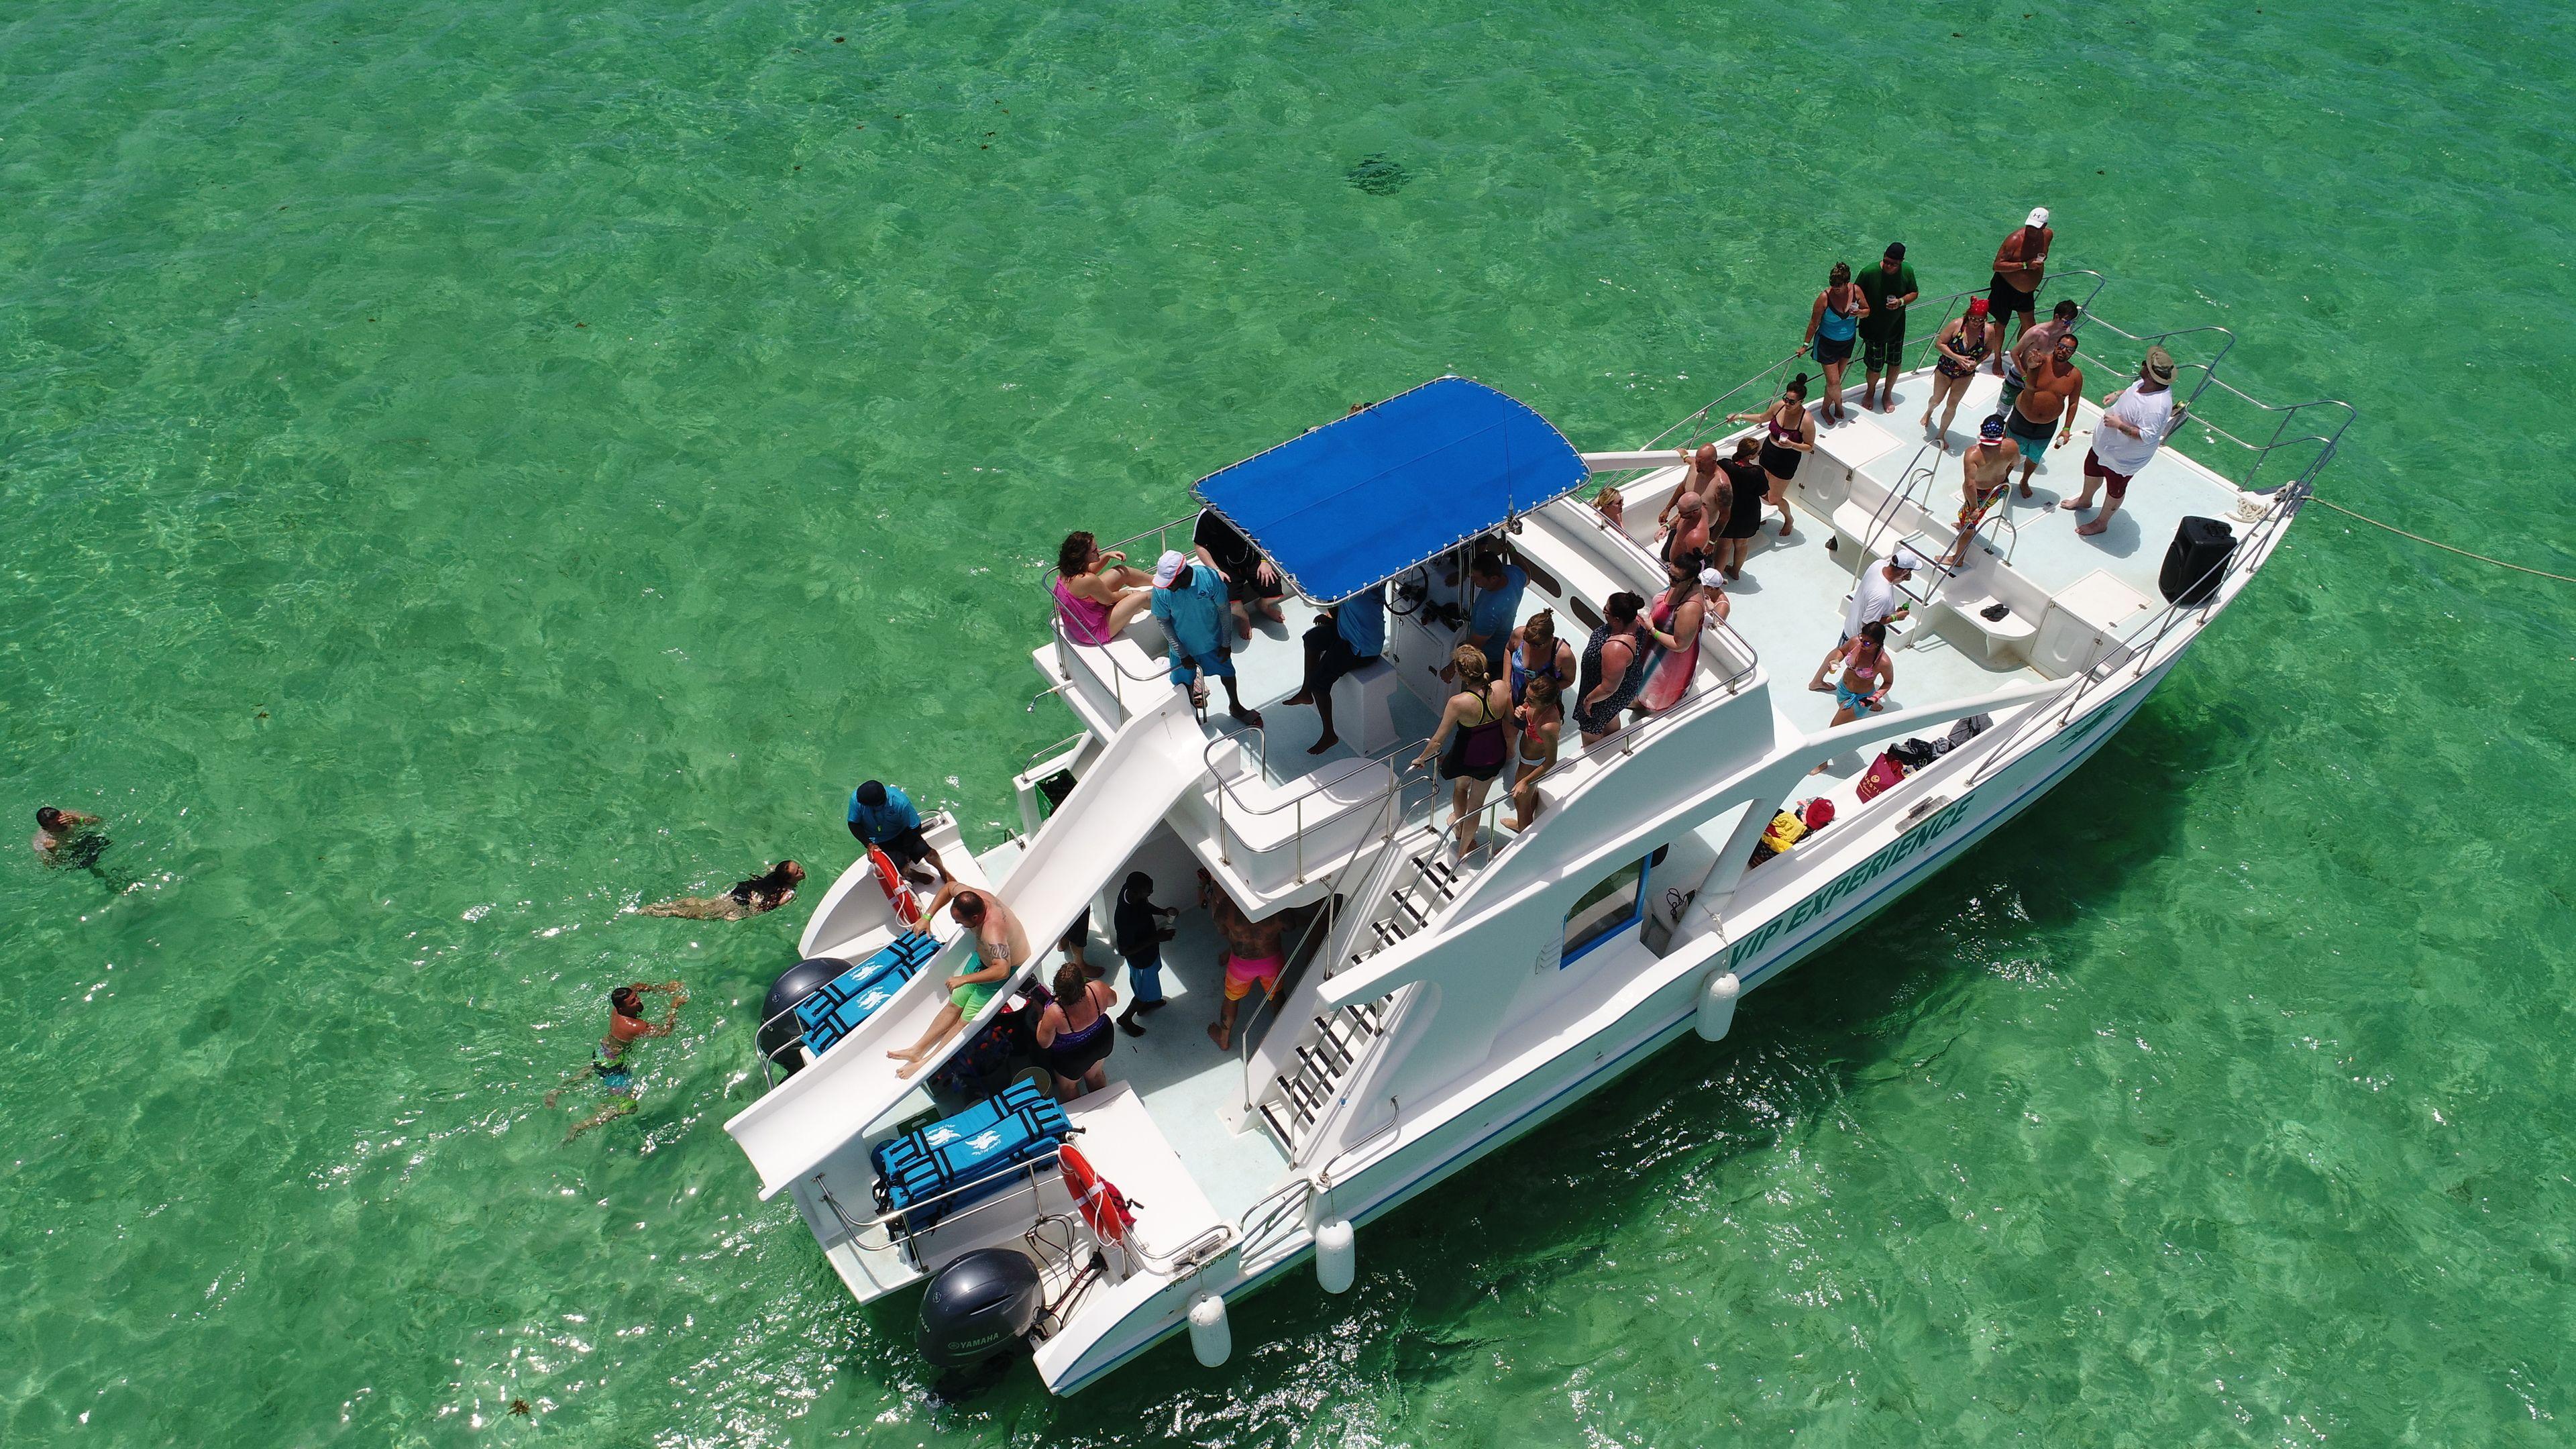 Aerial view of a catamaran group tour in Punta Cana